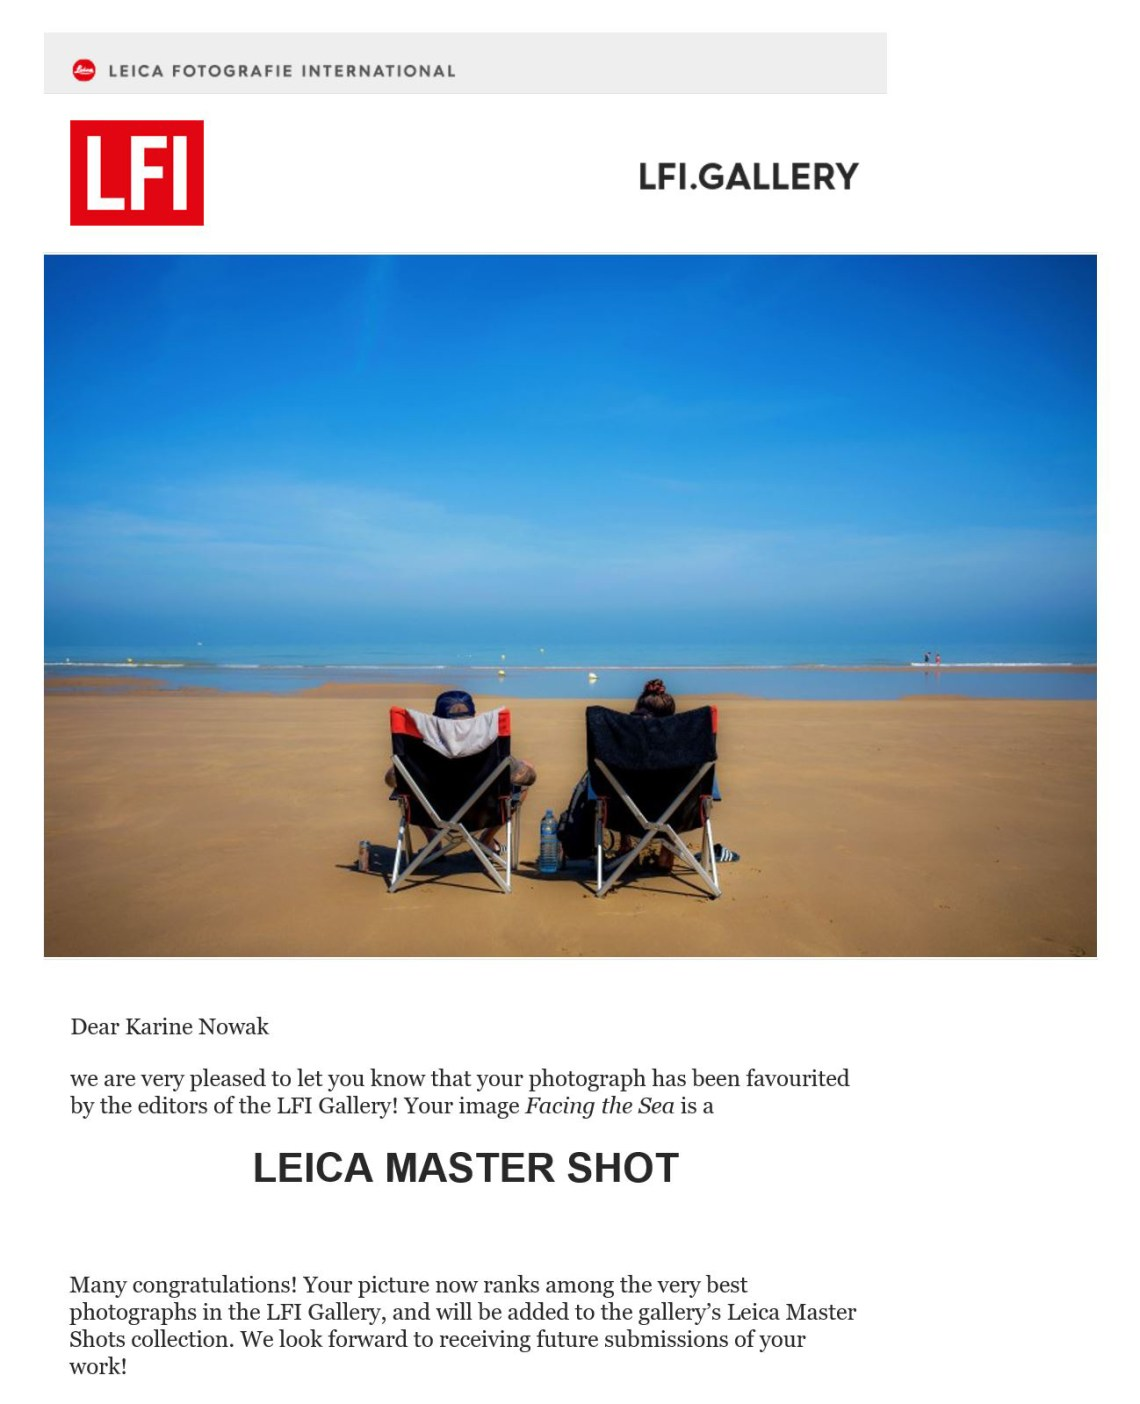 Leica Fotografie International LFI Gallery Karine Nowak